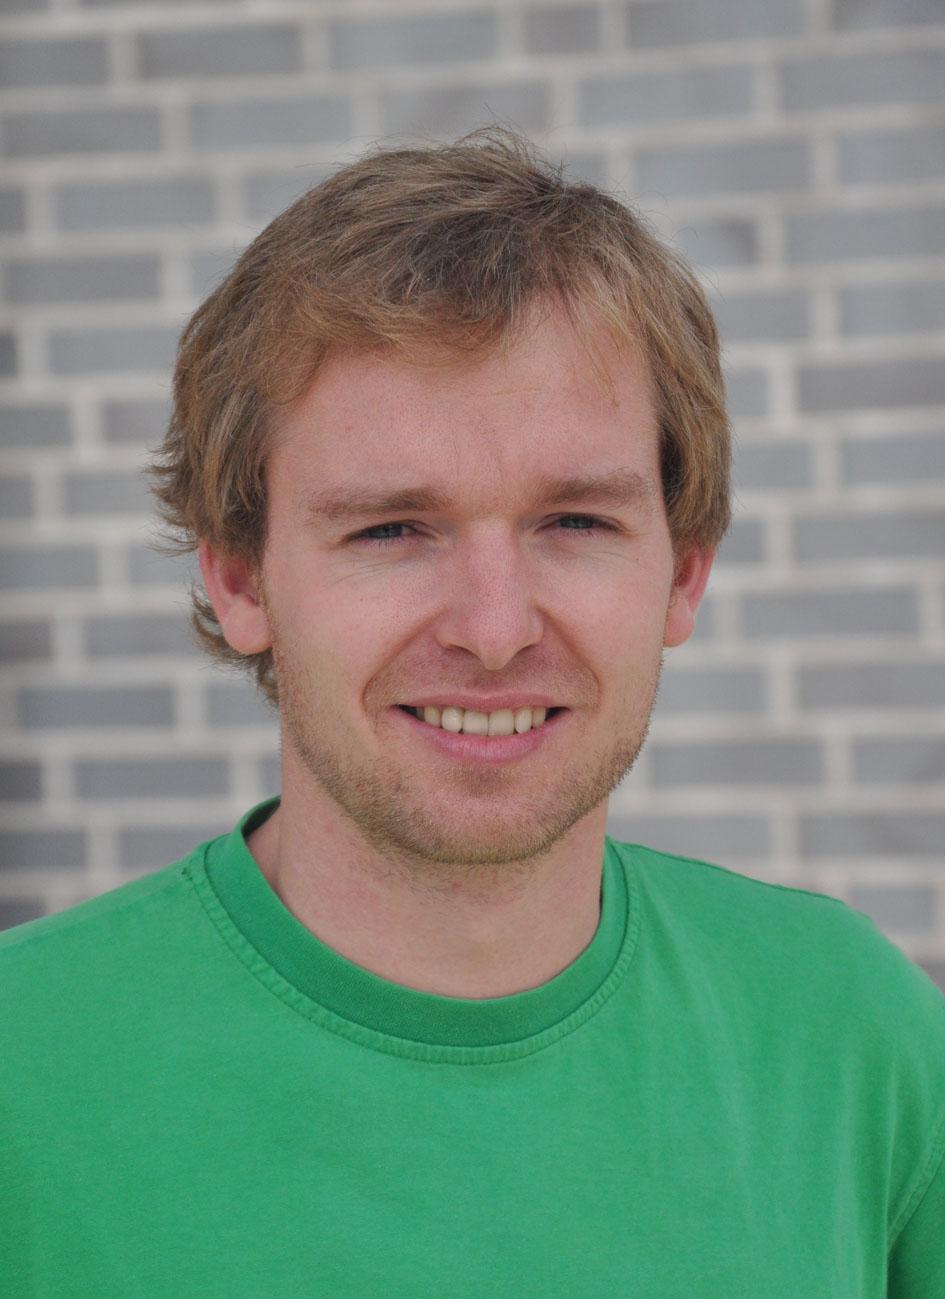 Daniel Hertkorn